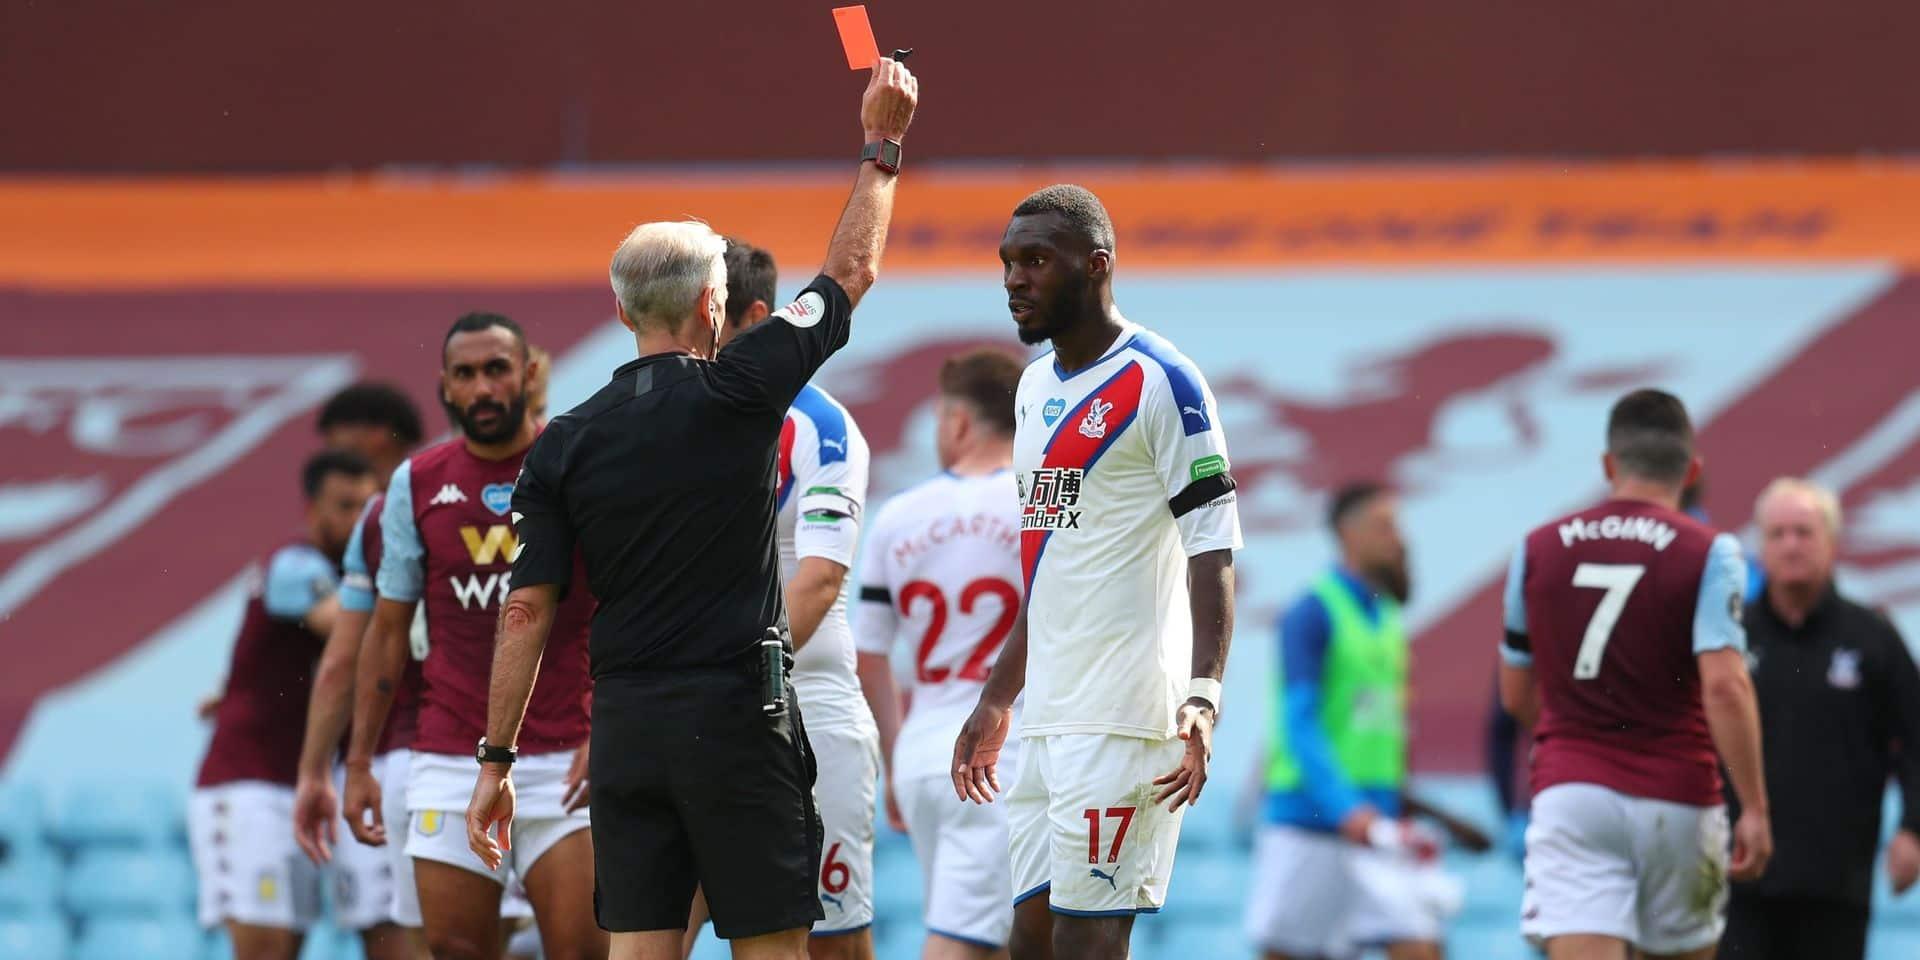 Crystal Palace battu par Aston Villa, Benteke exclu après le coup de sifflet final